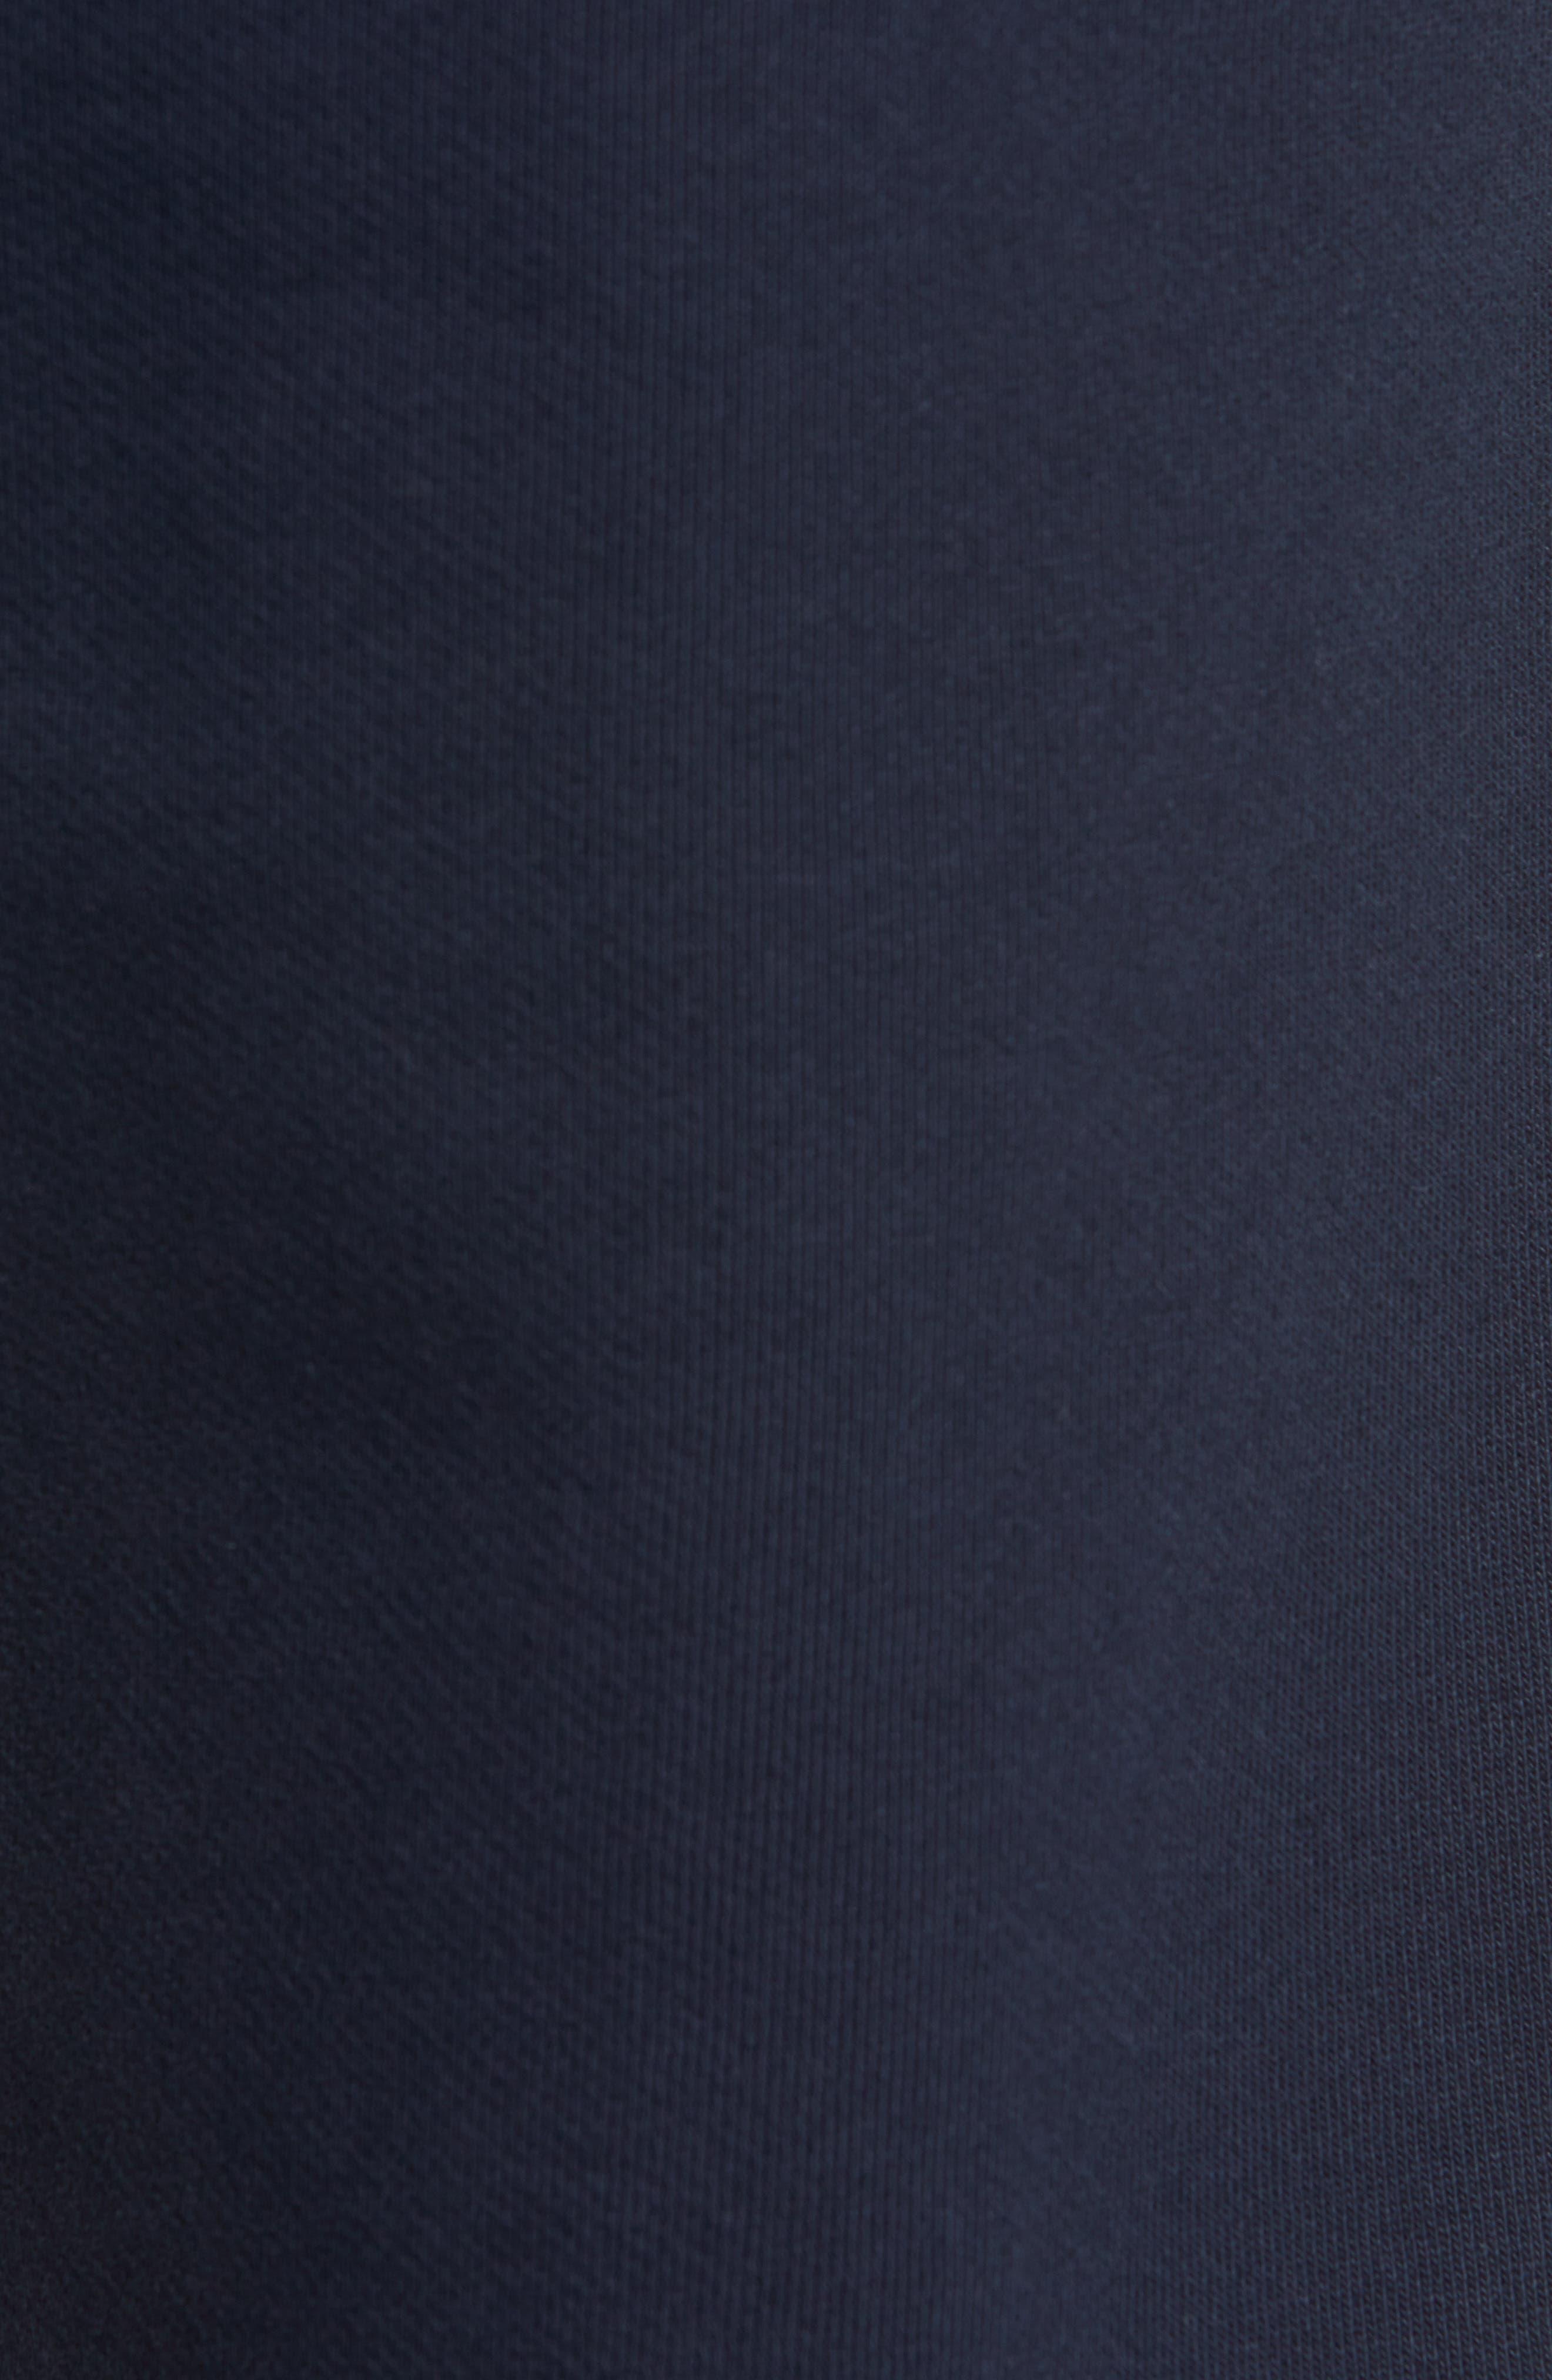 Embroidered Crest Sweatpants,                             Alternate thumbnail 5, color,                             DARK SAPPHIRE